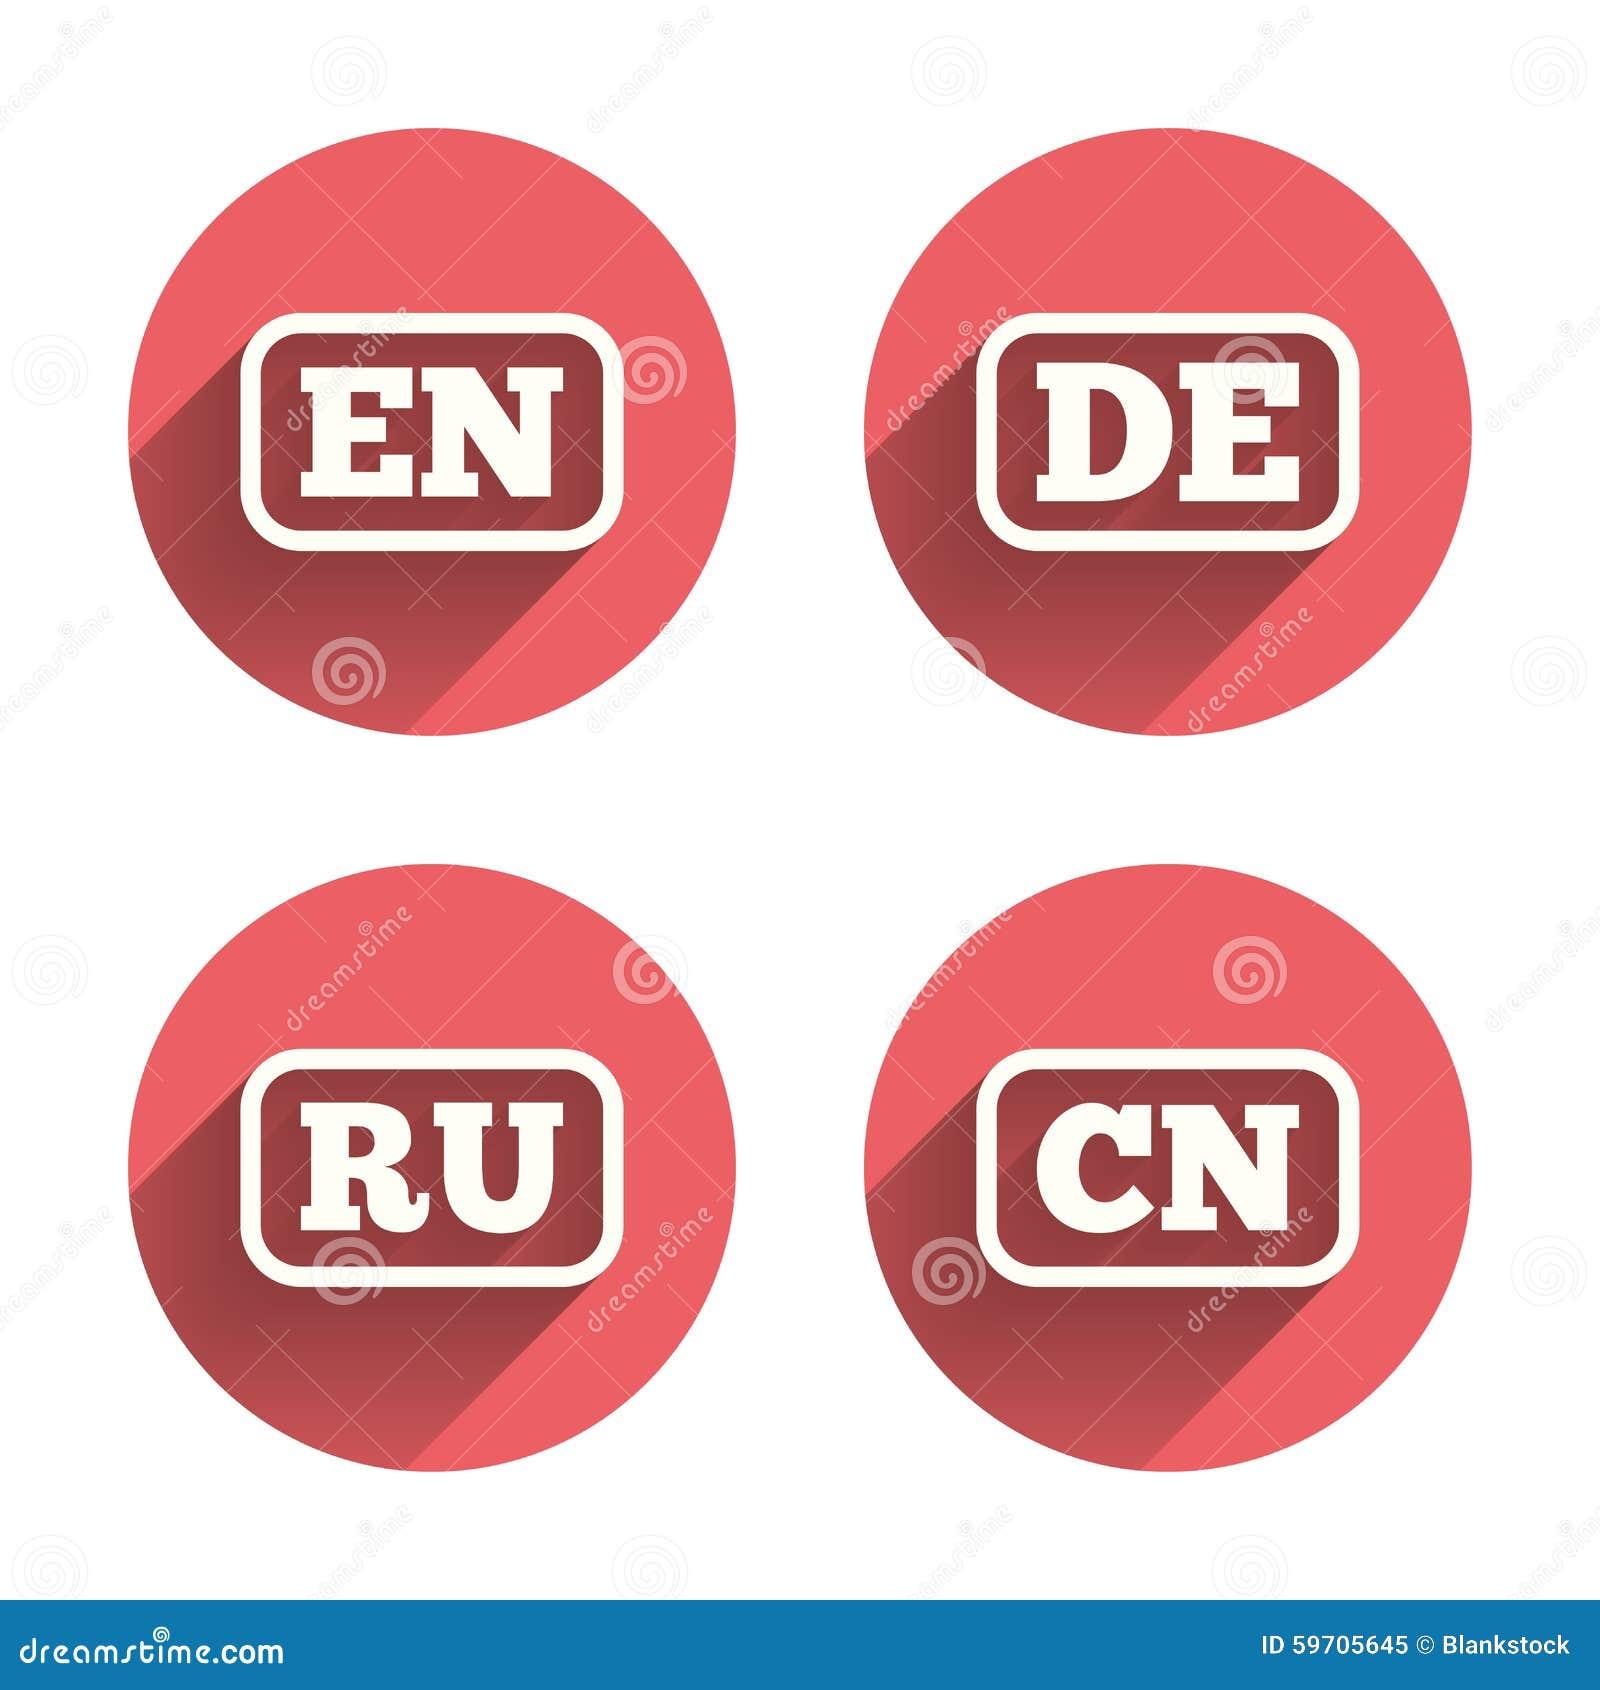 Language Icons En De Ru And Cn Translation Stock Vector